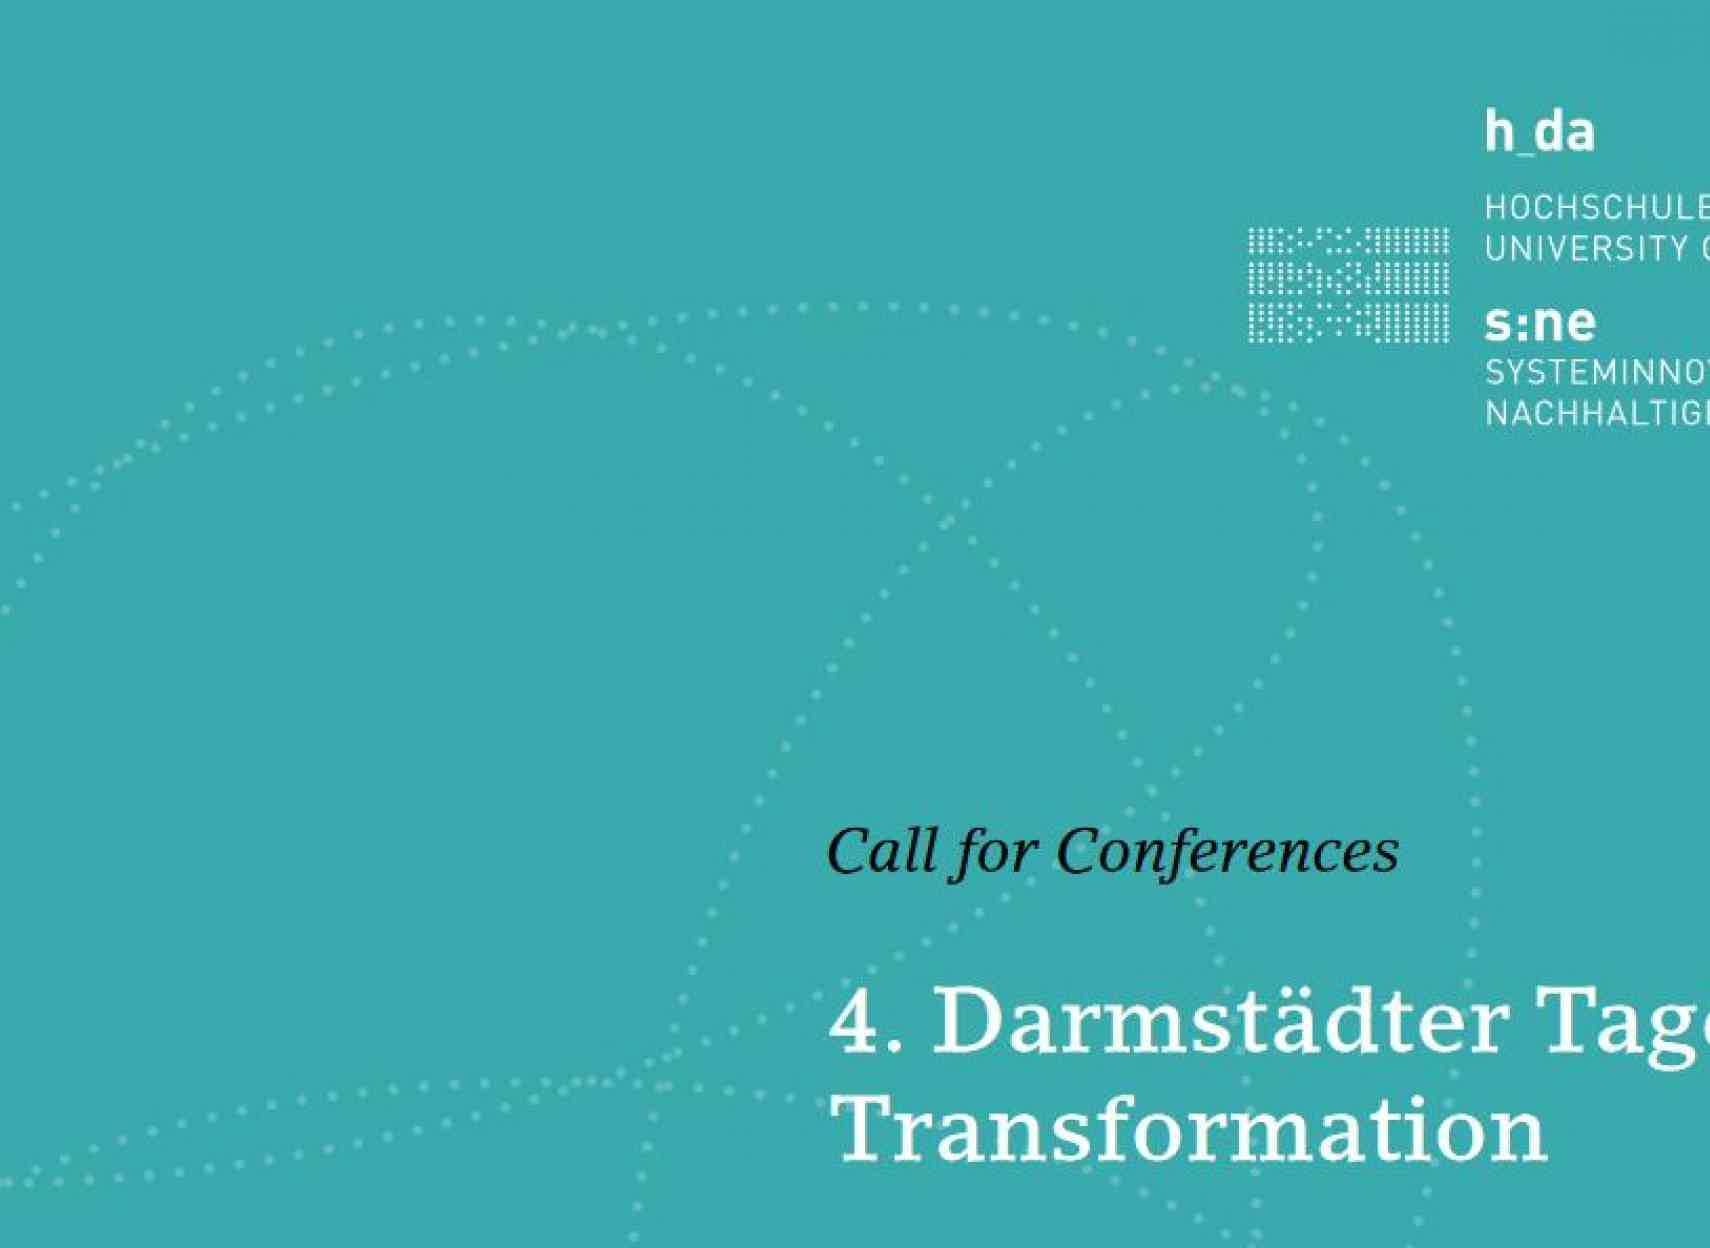 Call for Conferences: Darmstädter Tage der Transformation 2022